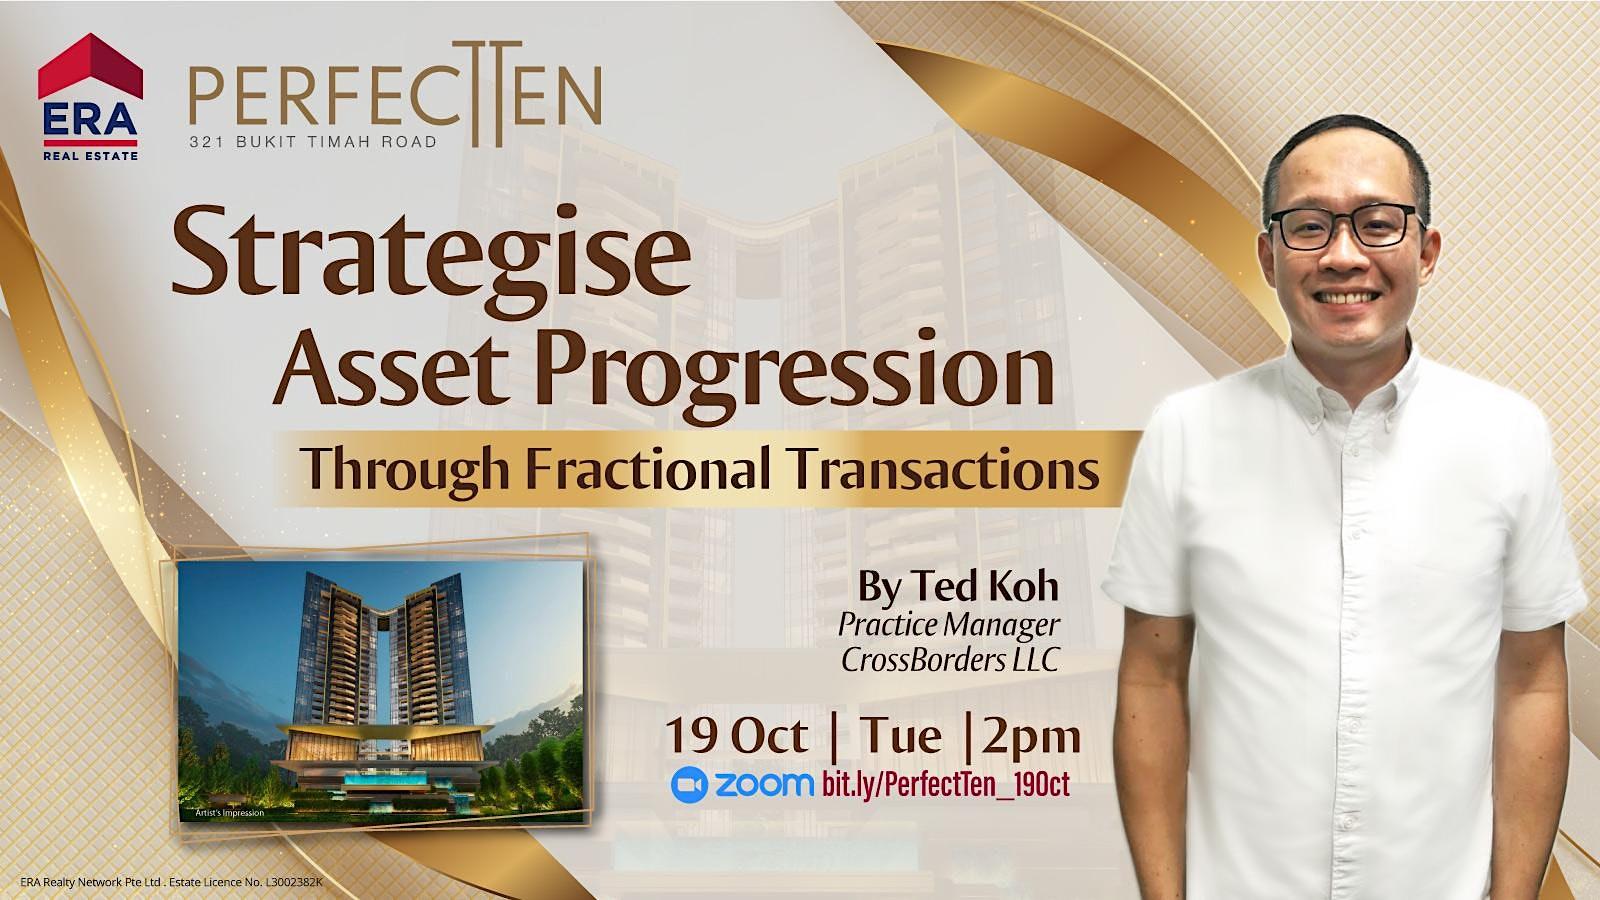 Strategise Asset Progression Through Fractional Transactions